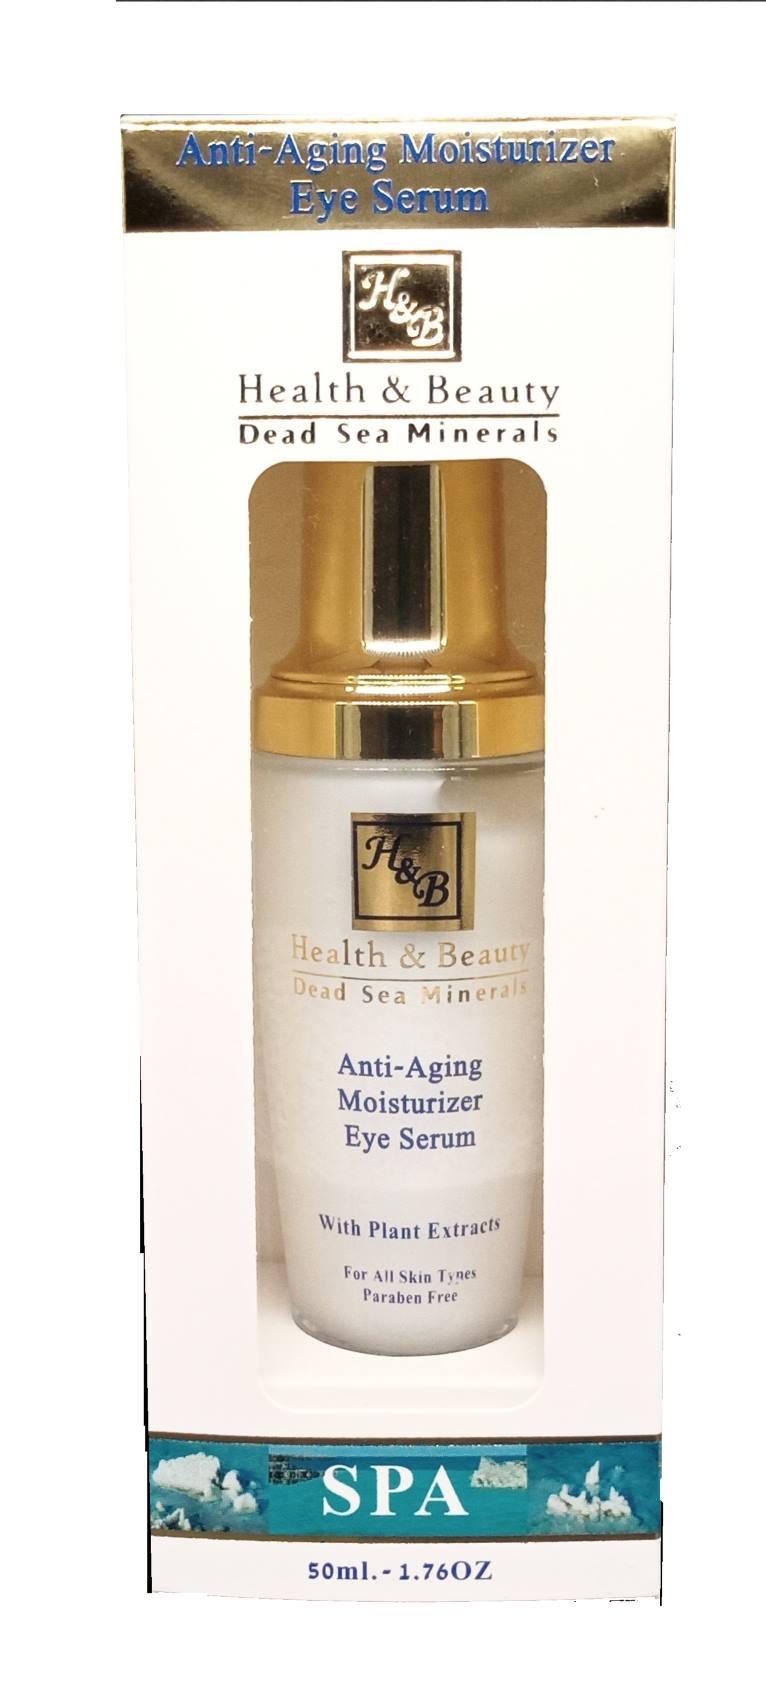 Гель для ухода за кожей Health & Beauty вокруг глаз